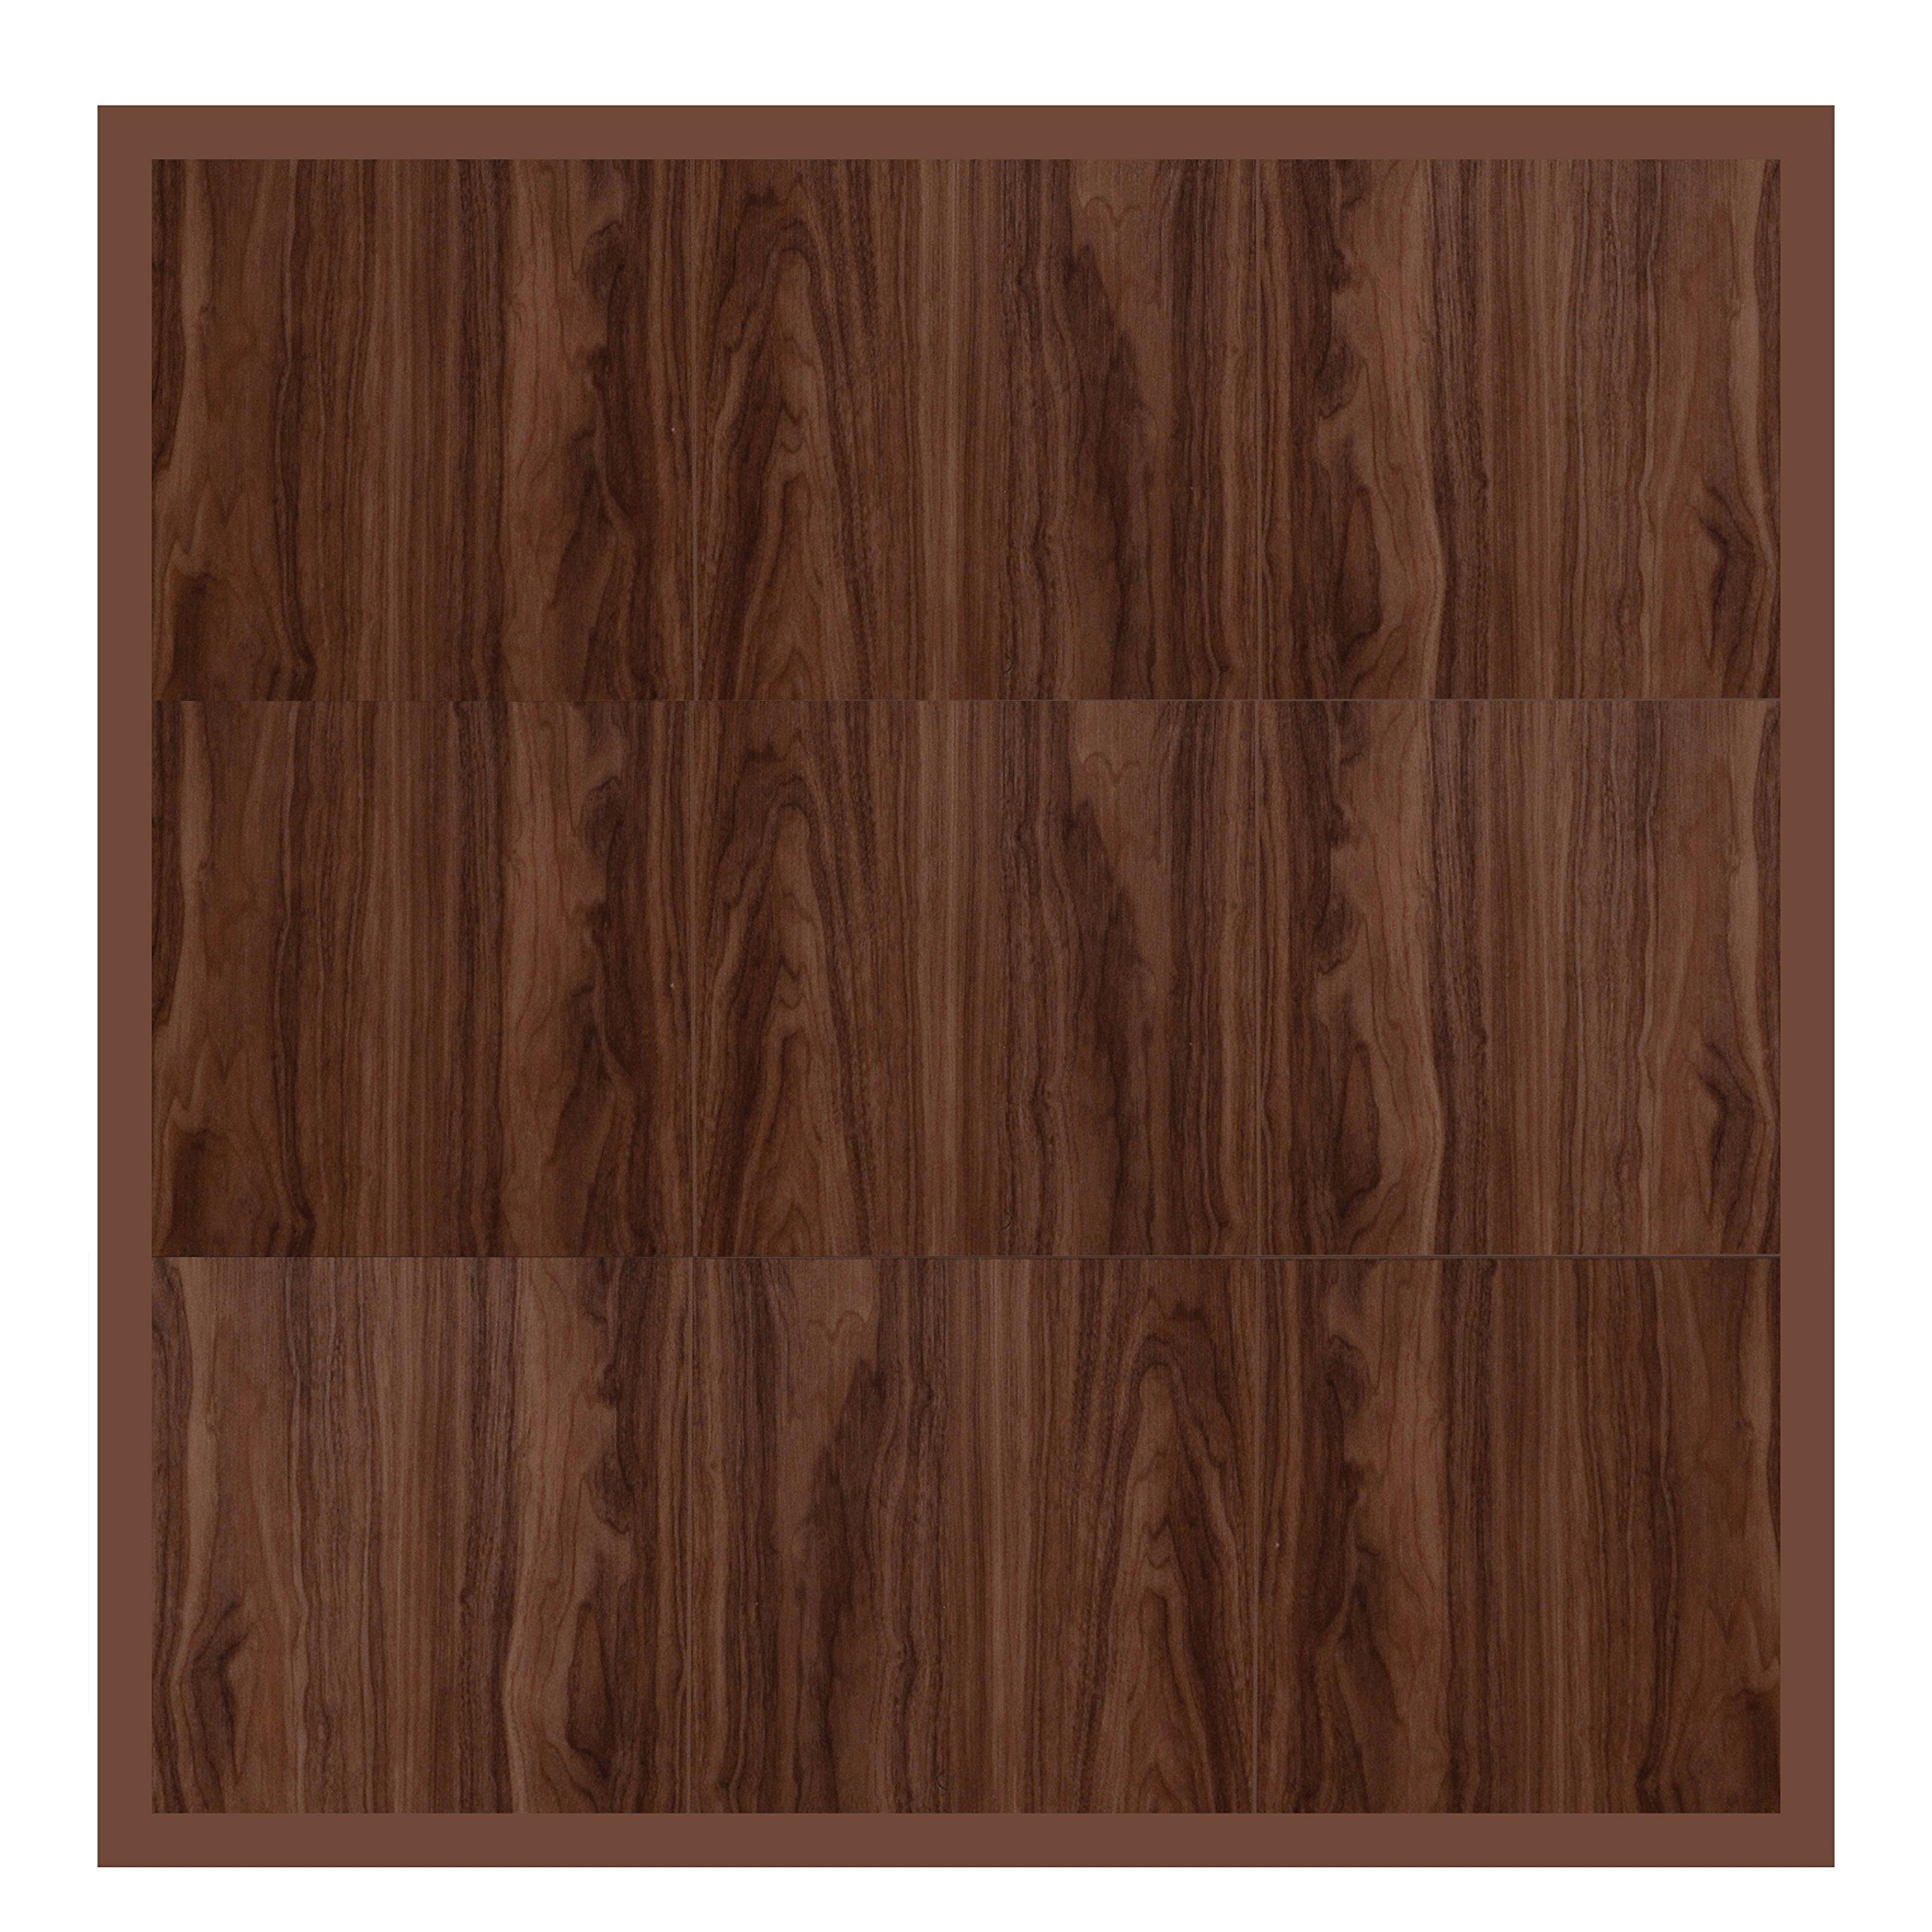 "Swisstrax ¾"" thick Interlocking ""Hardwood"" Floor Tiles w/ Edges & Corners (4' x 4' Pad) - Dance Floors, Office Areas, Event Floors & more! (Medium Maple) by Swisstrax"